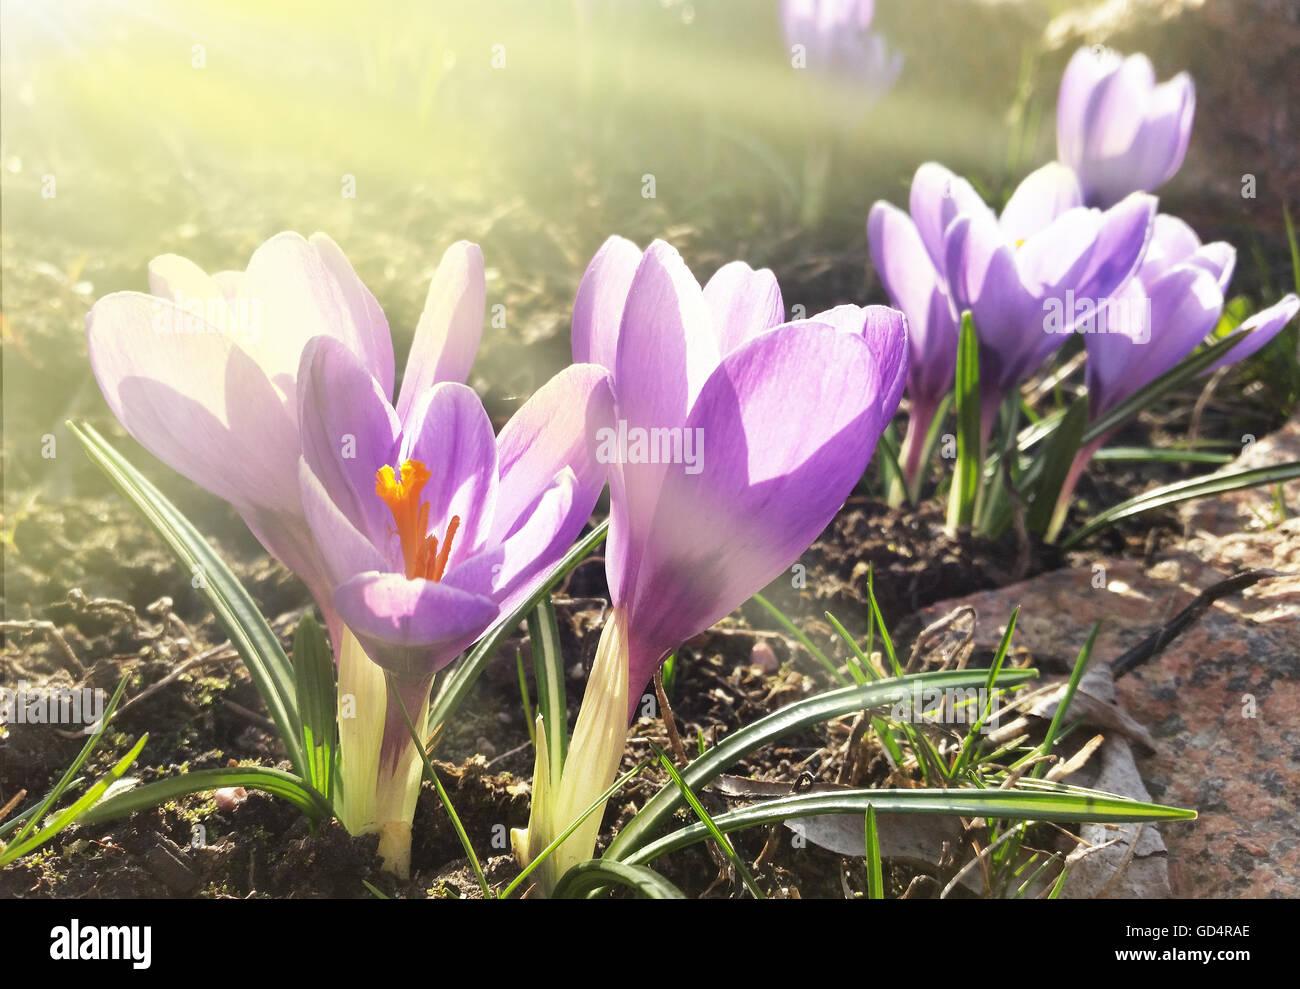 crocus blooming spring flowers stock photo royalty free image